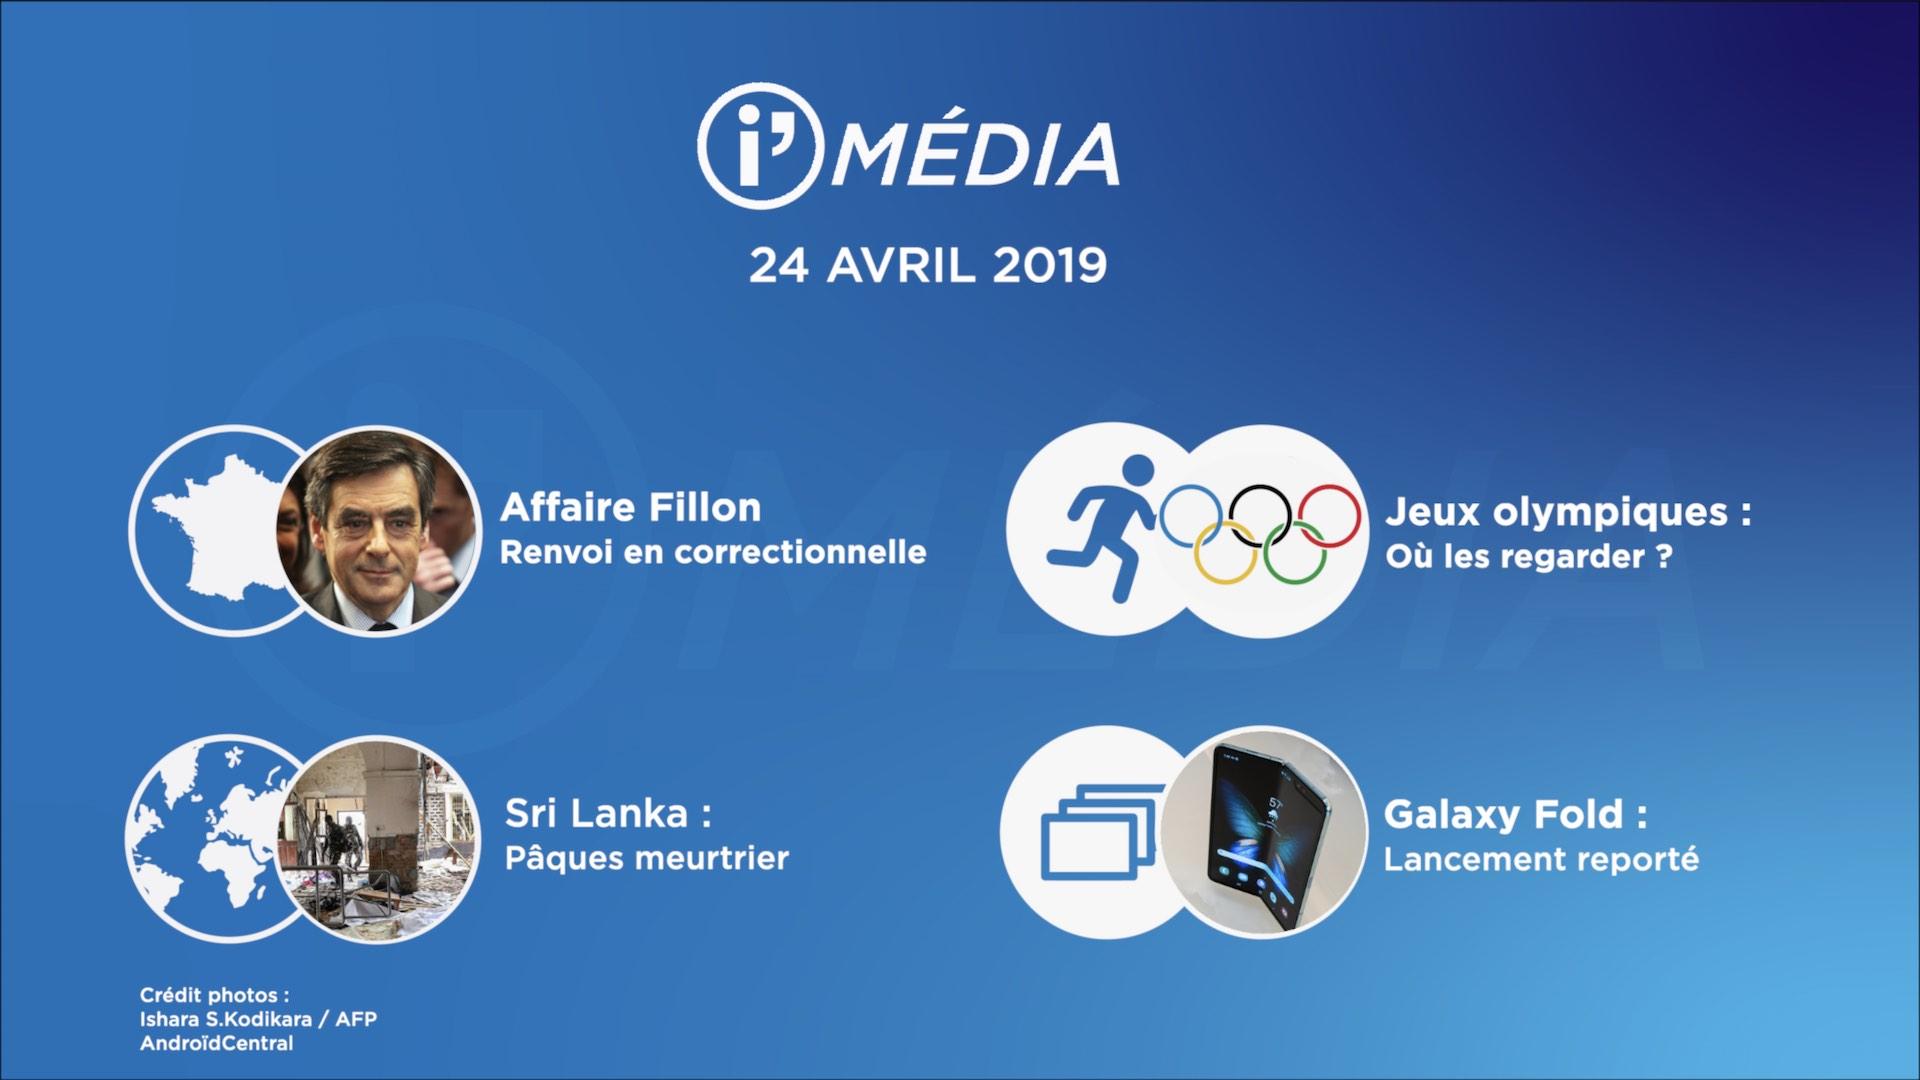 I'média 24 avril 2019